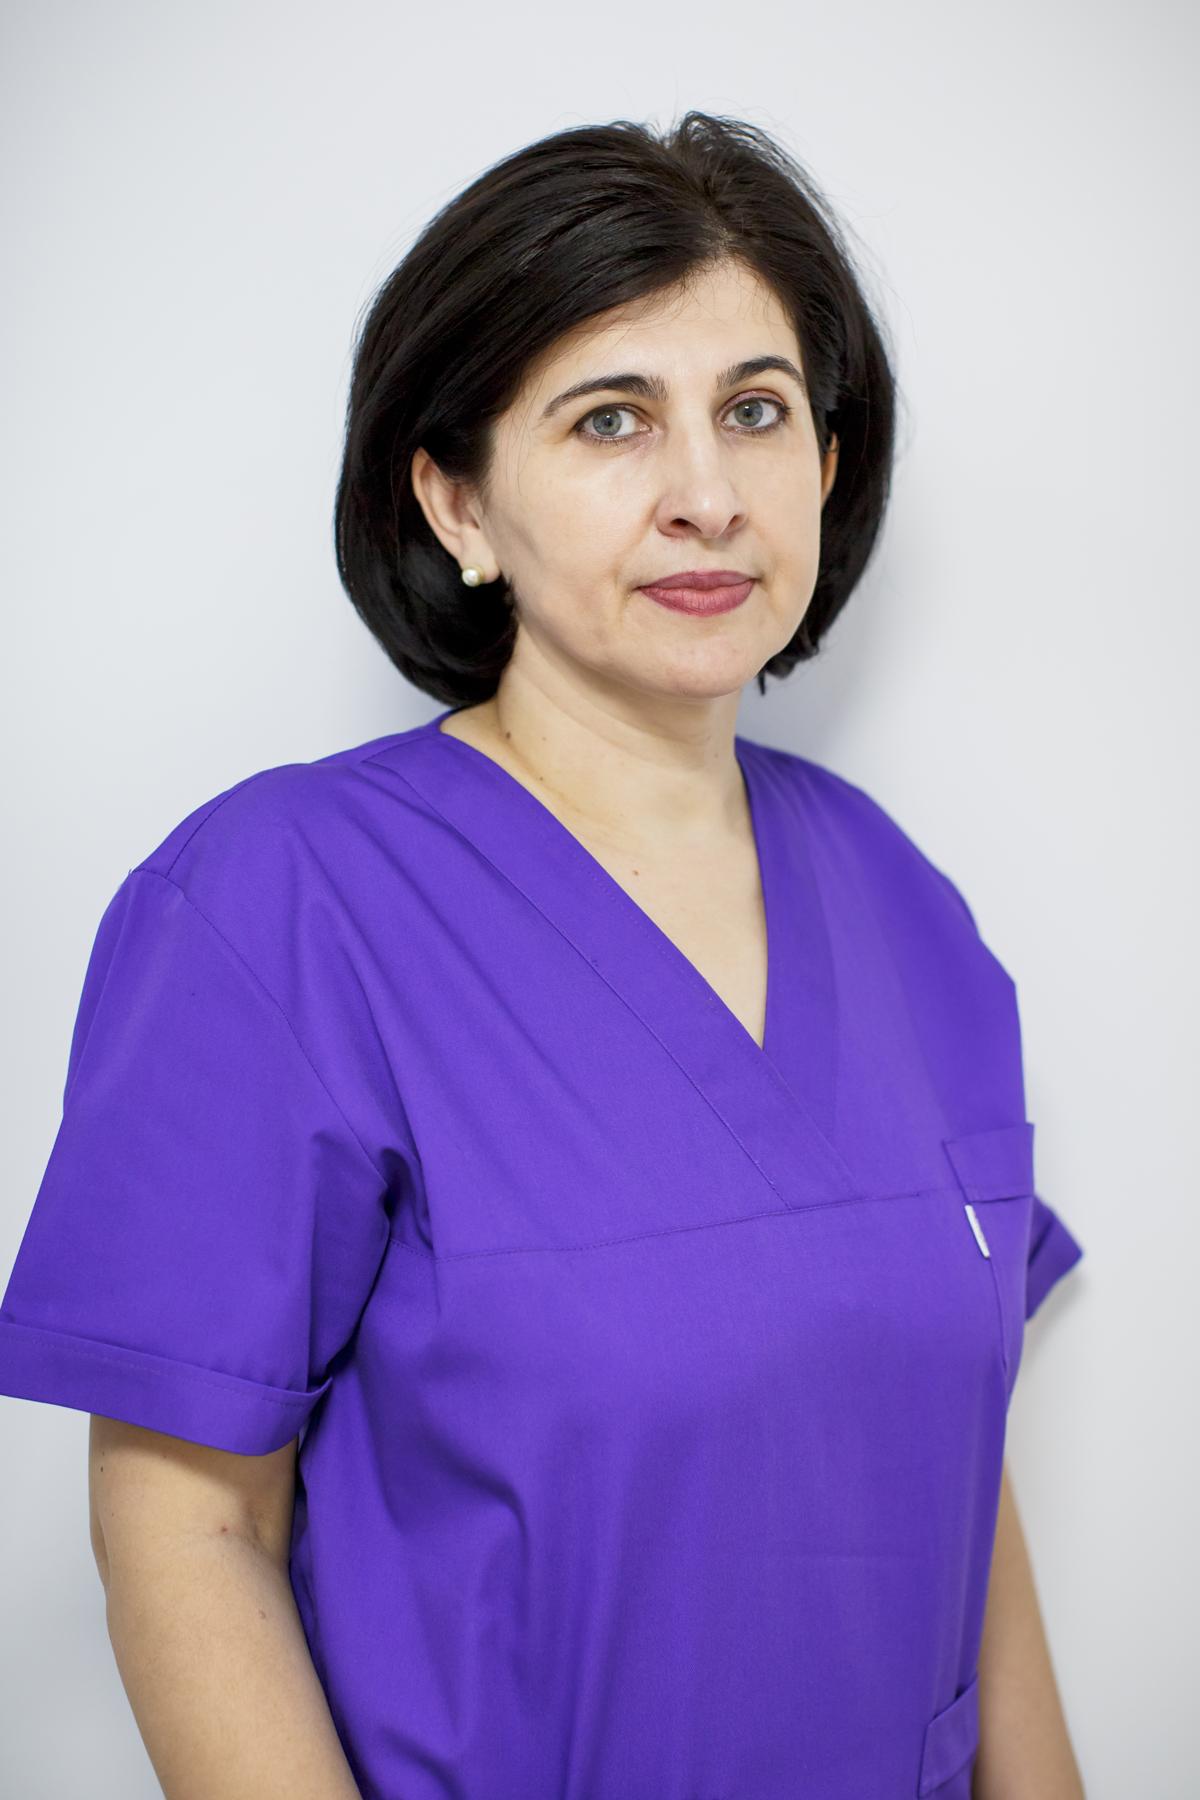 http://dentalplus.ro/wp-content/uploads/2015/11/dr-Doina-Popovici.png